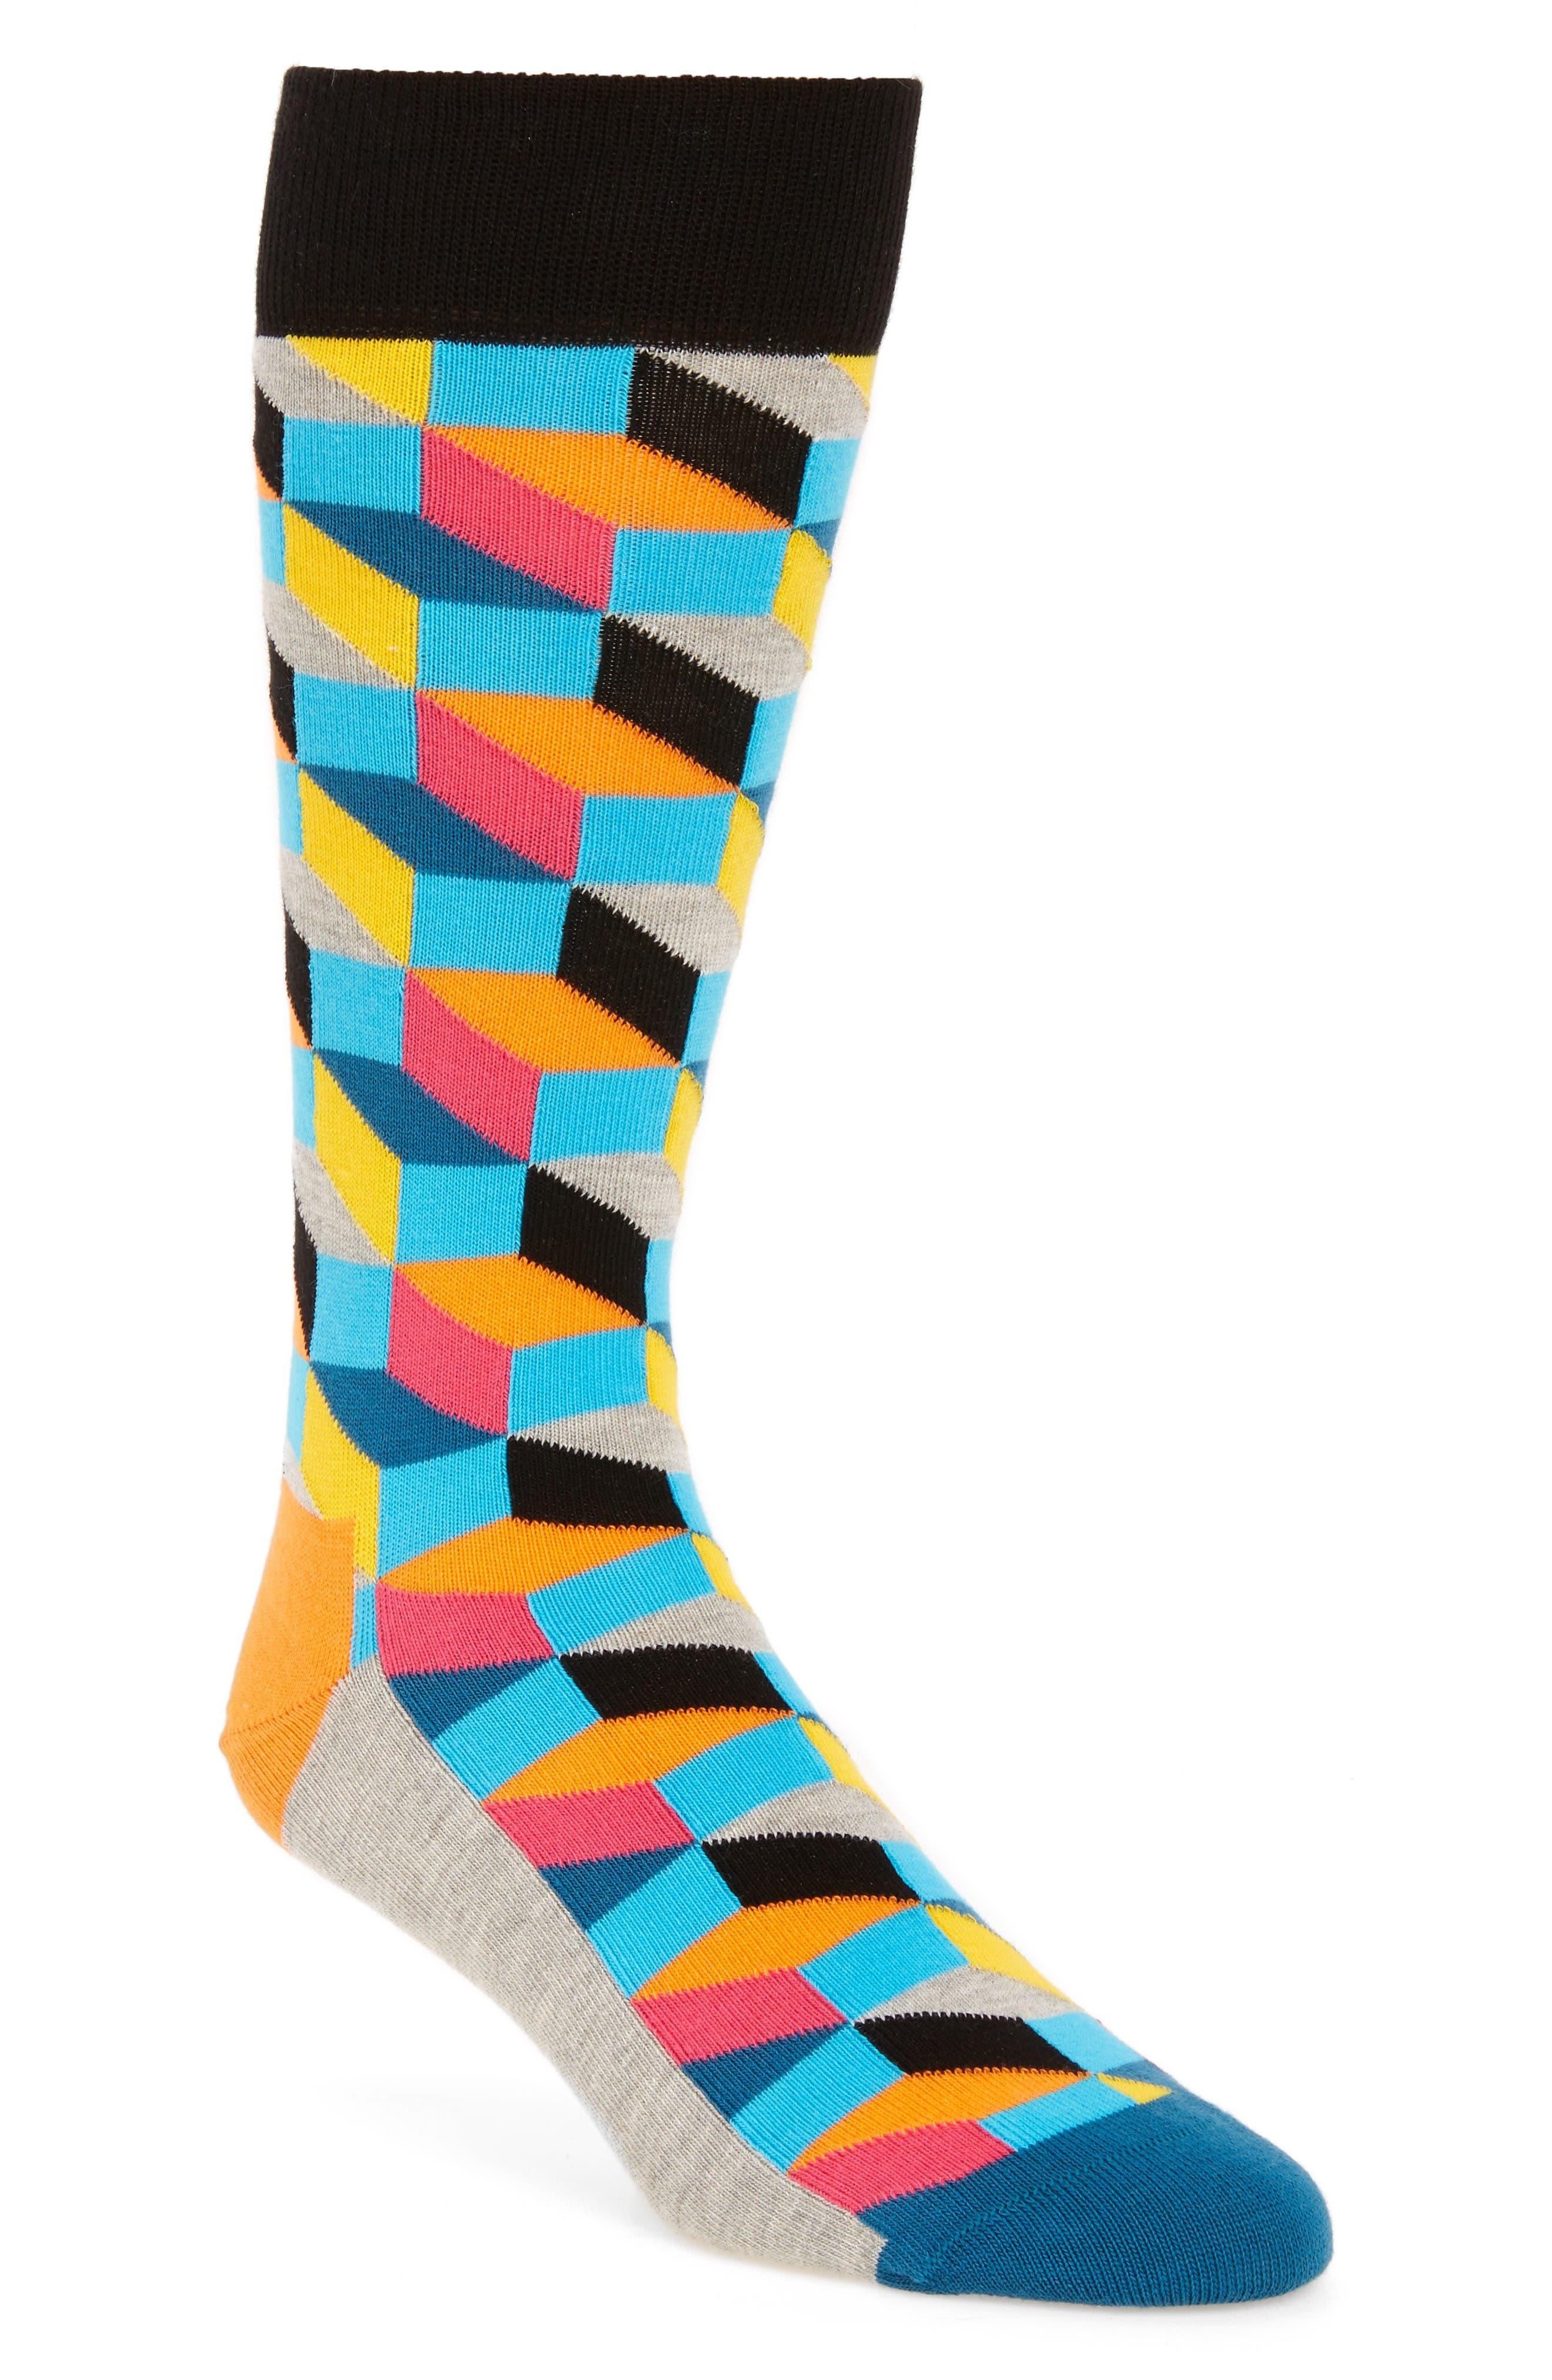 Geometric Cotton Blend Socks,                         Main,                         color, Blue/ Yellow